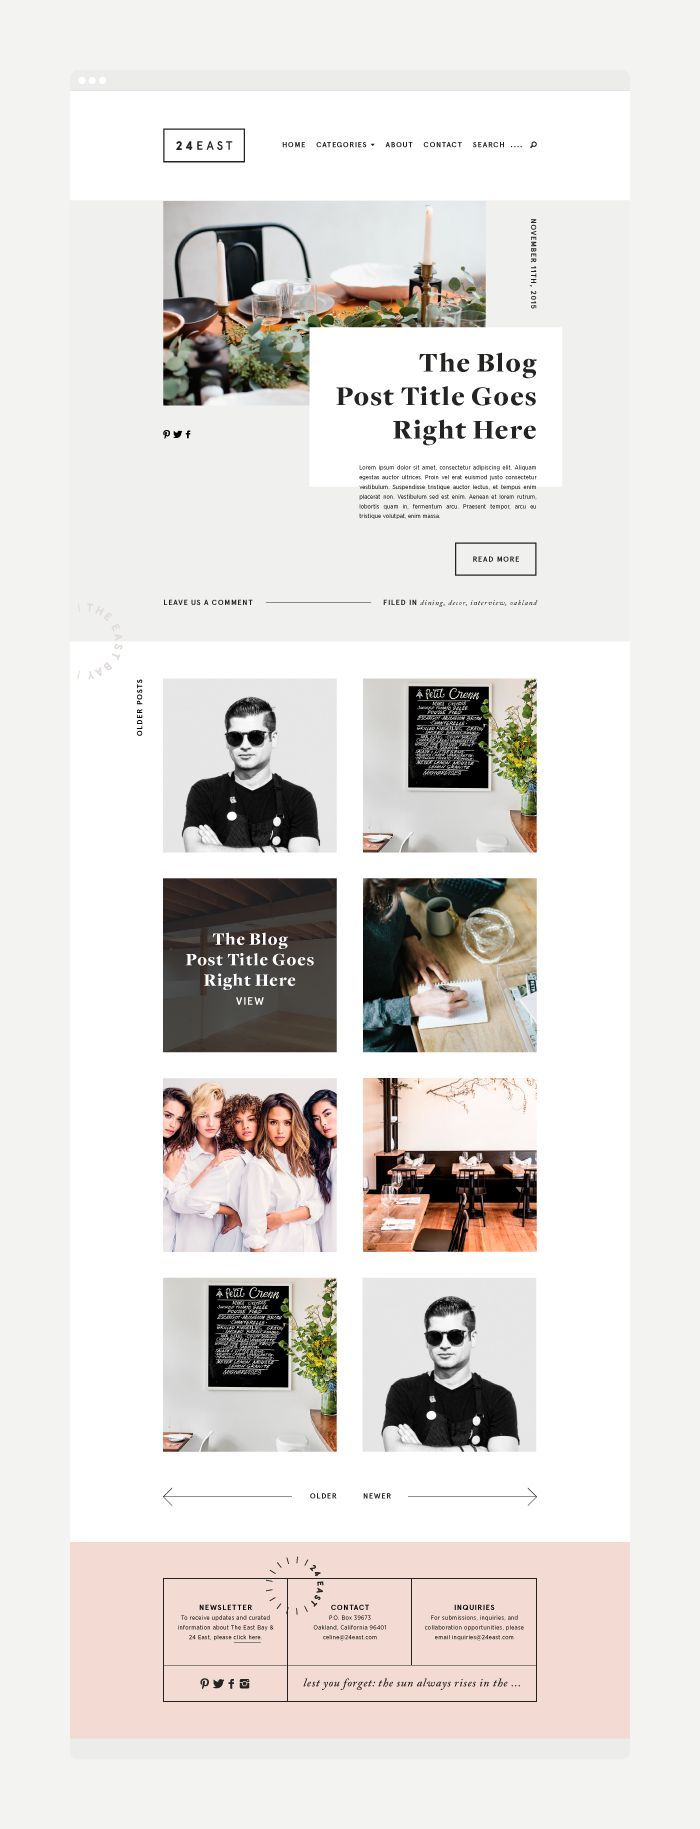 24 East | Branding + Web Design by Rowan Made